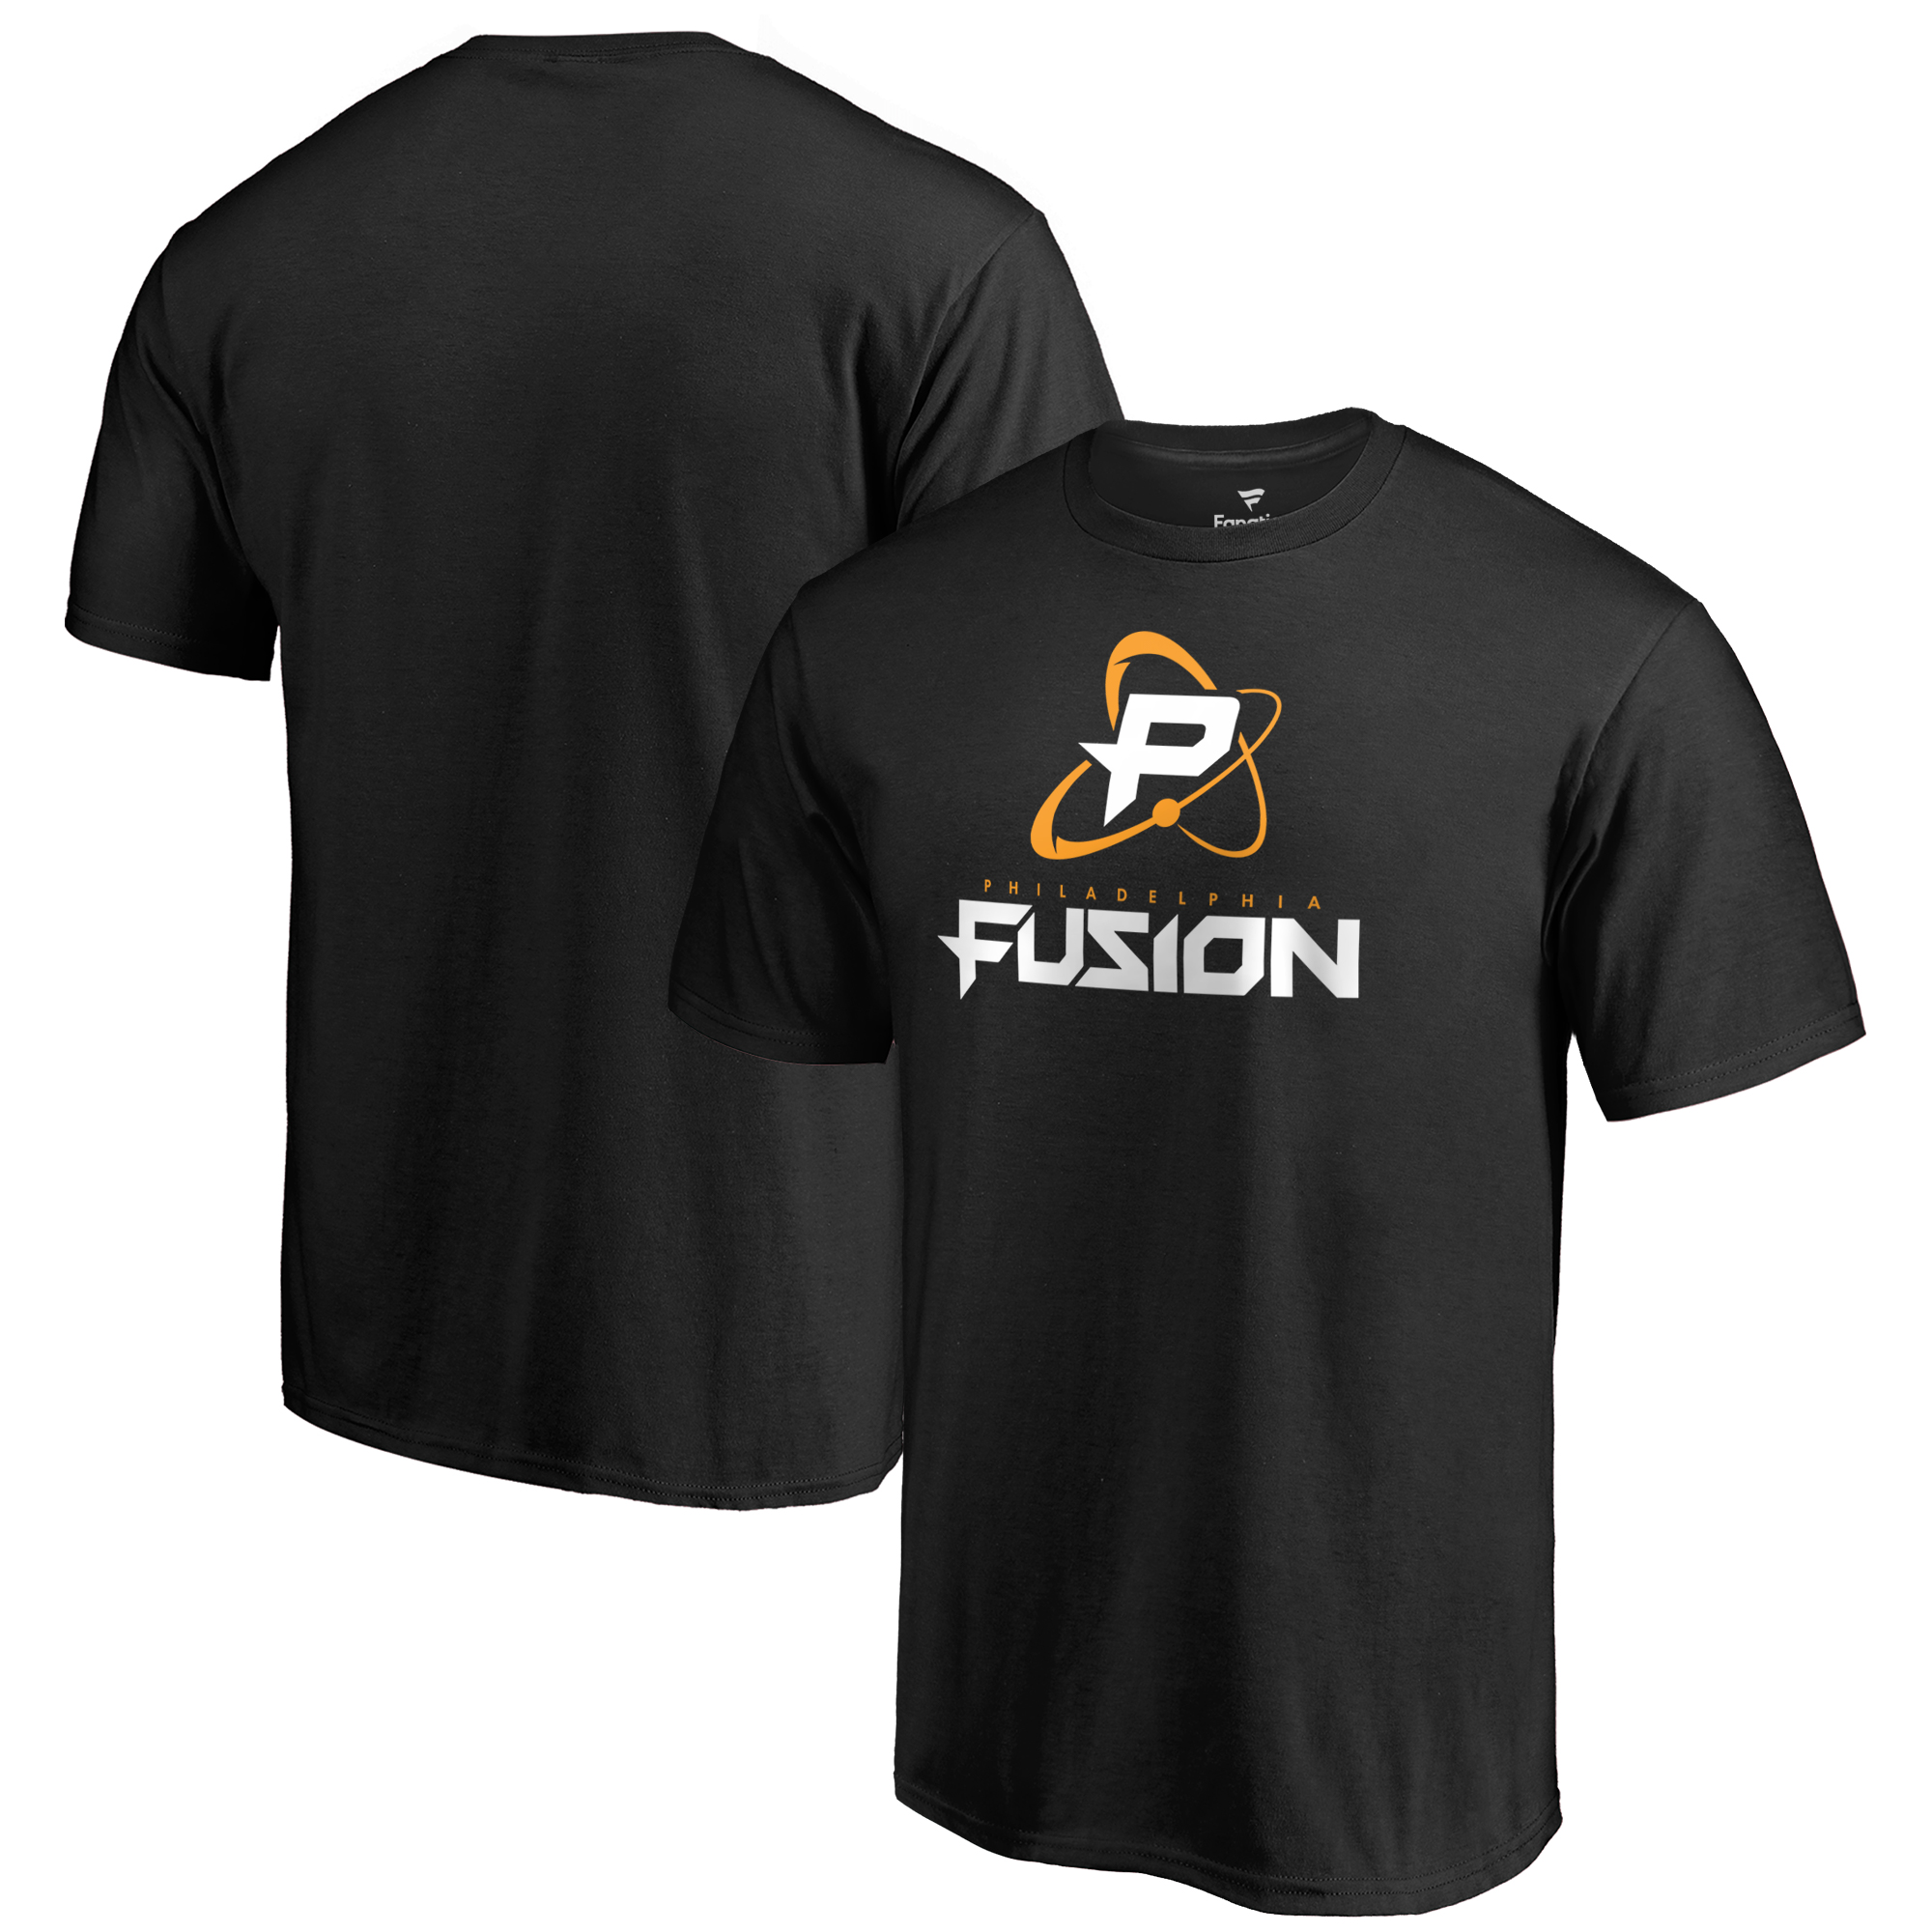 Philadelphia Fusion Fanatics Branded Team Identity T-Shirt - Black